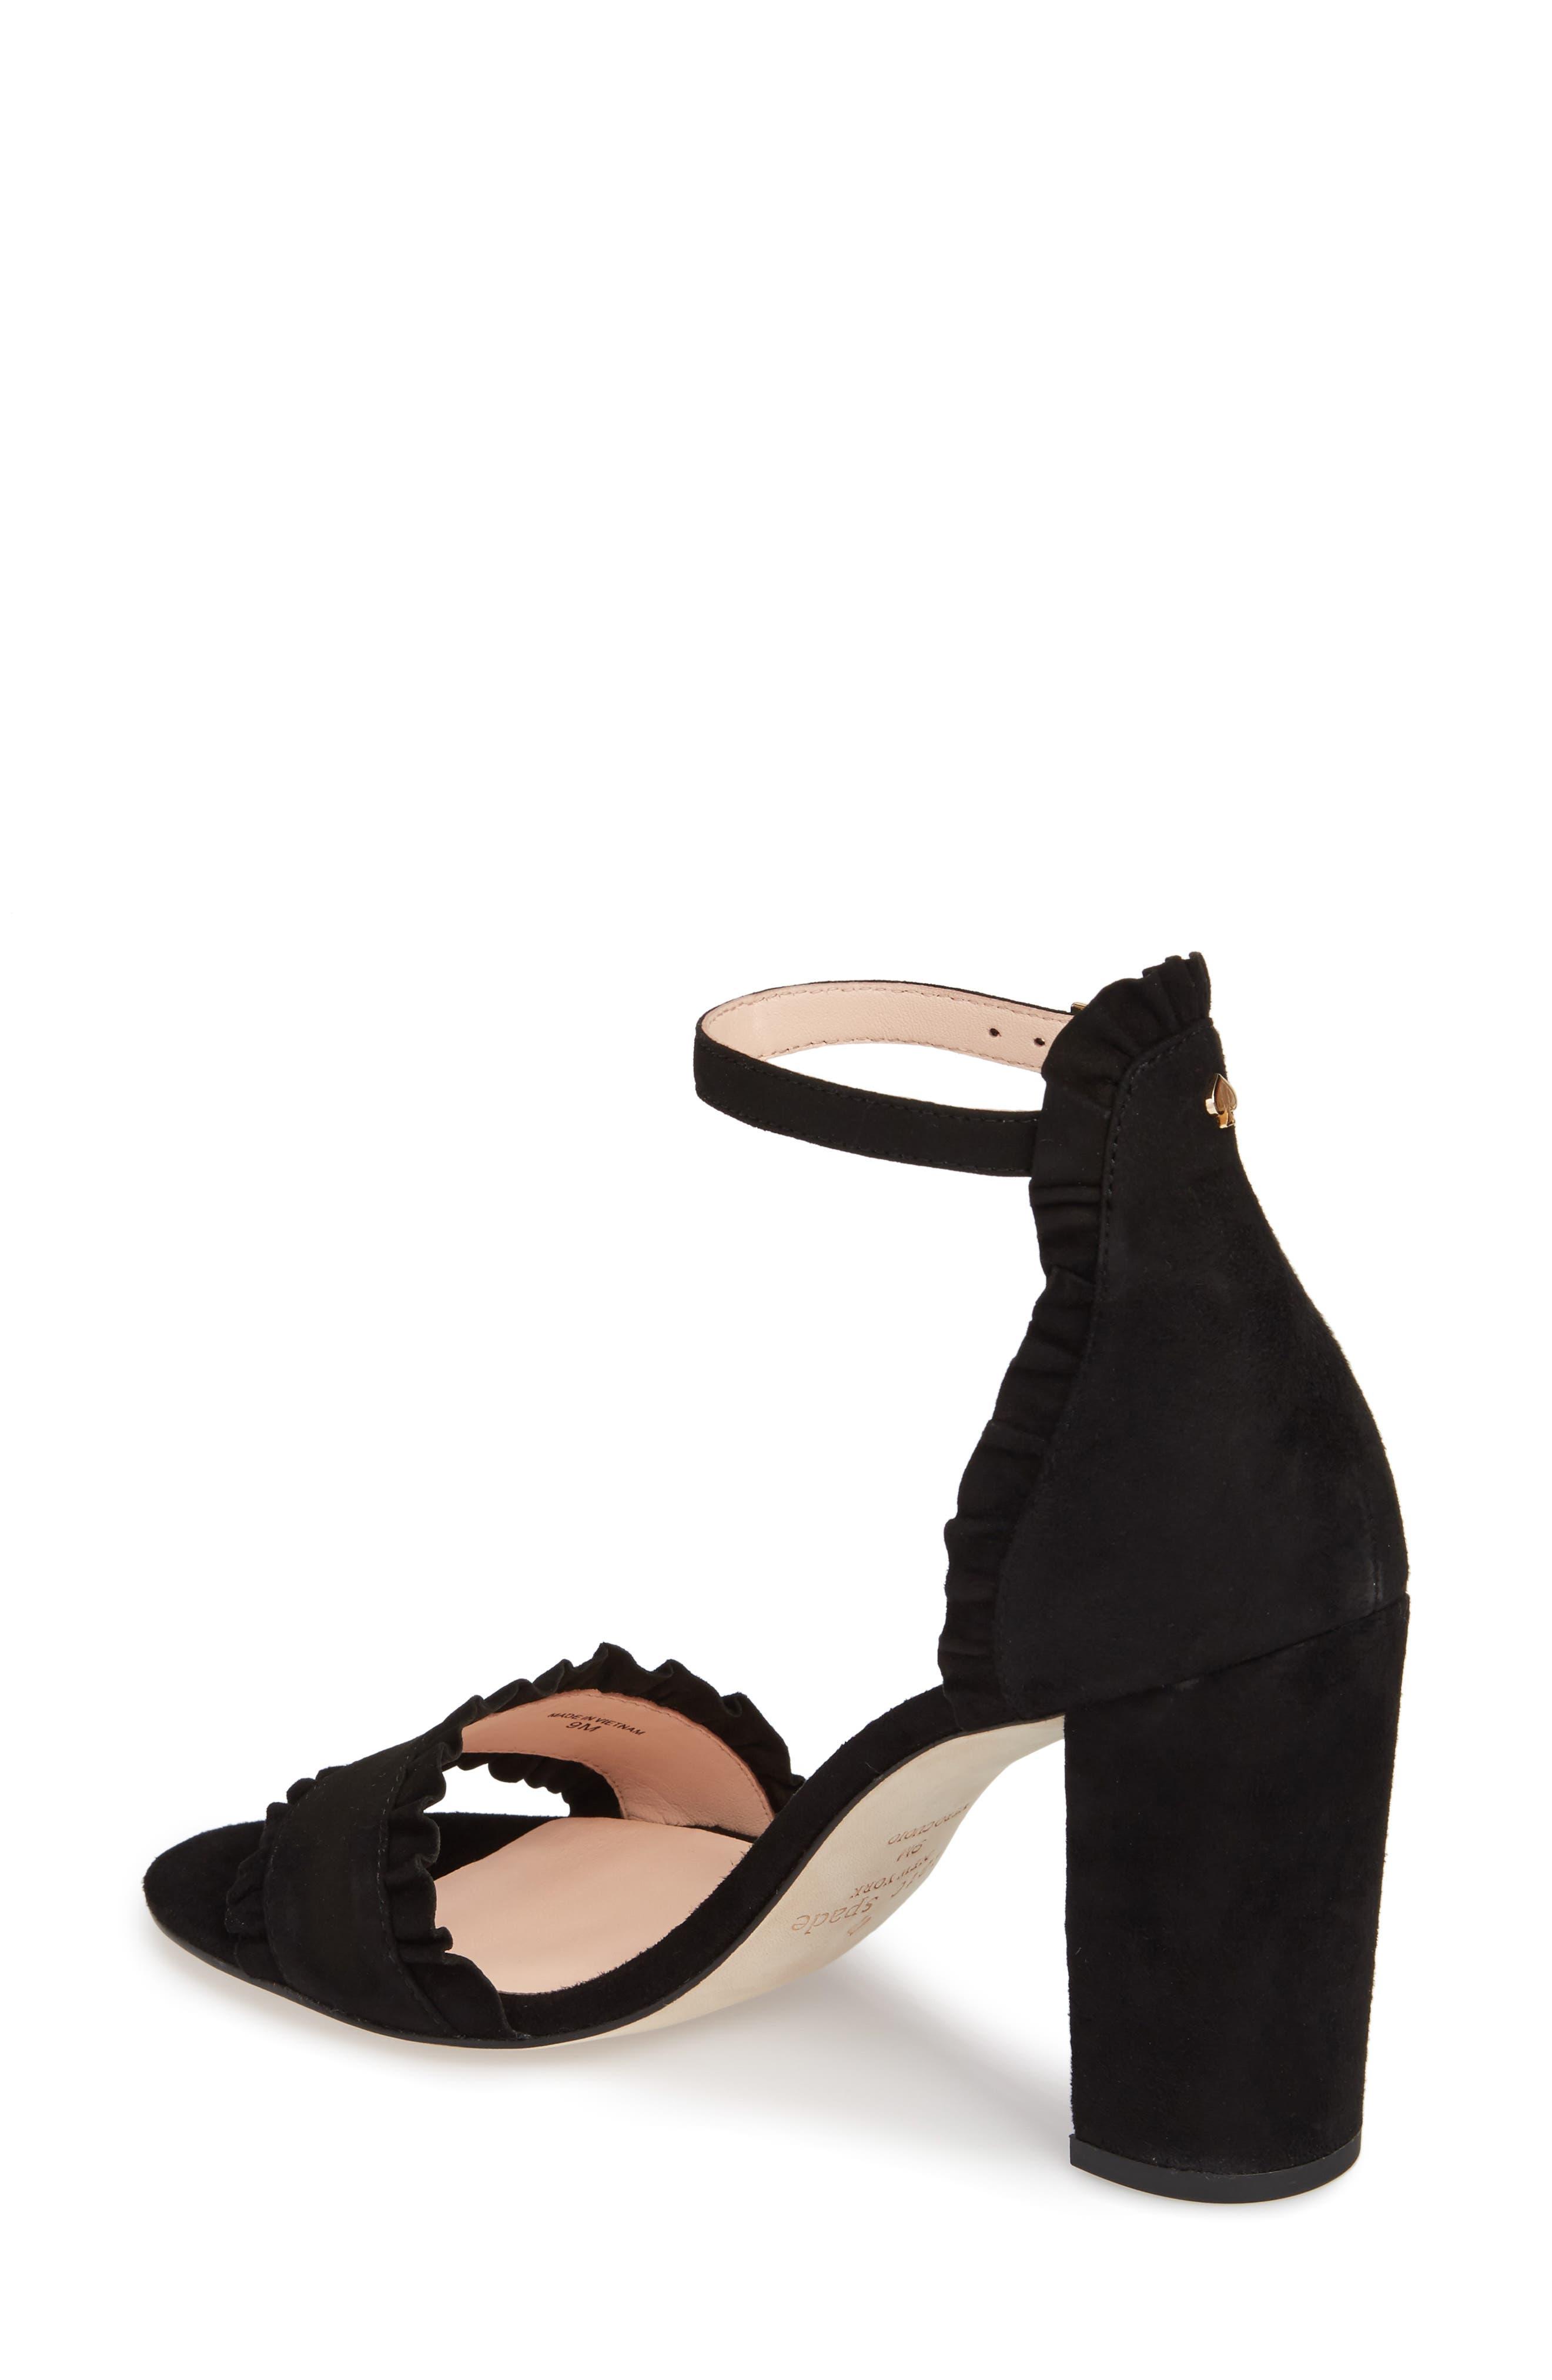 odele ruffle sandal,                             Alternate thumbnail 2, color,                             Black Suede